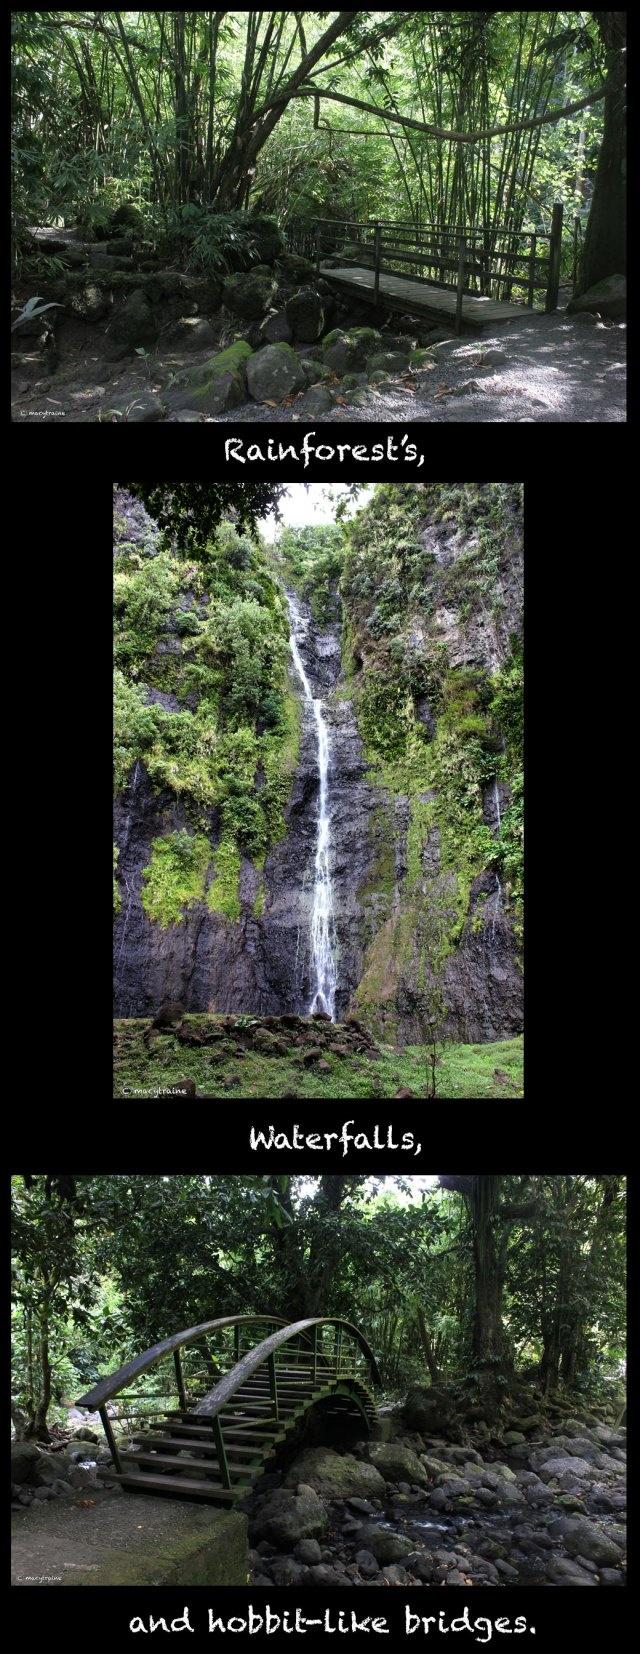 Rainforest, waterfall and bridges